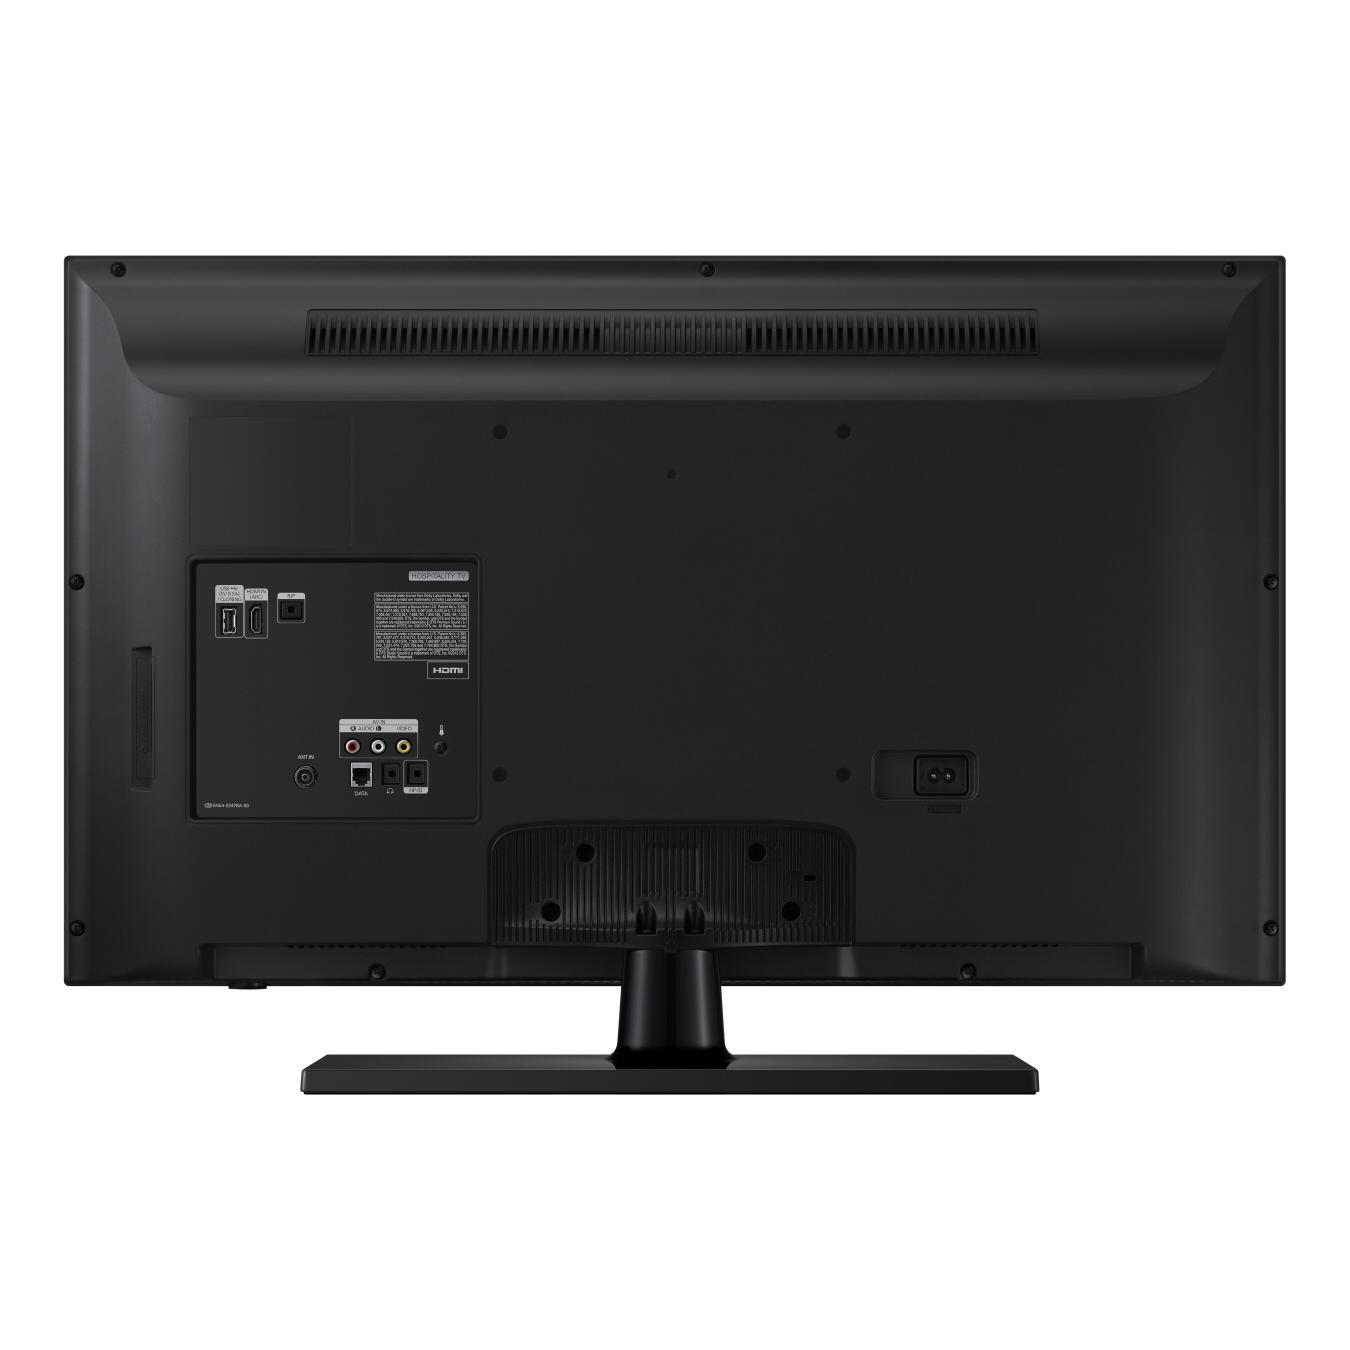 "TV Samsung LED HG32EC470GW - 32"" Modèle Hotel"